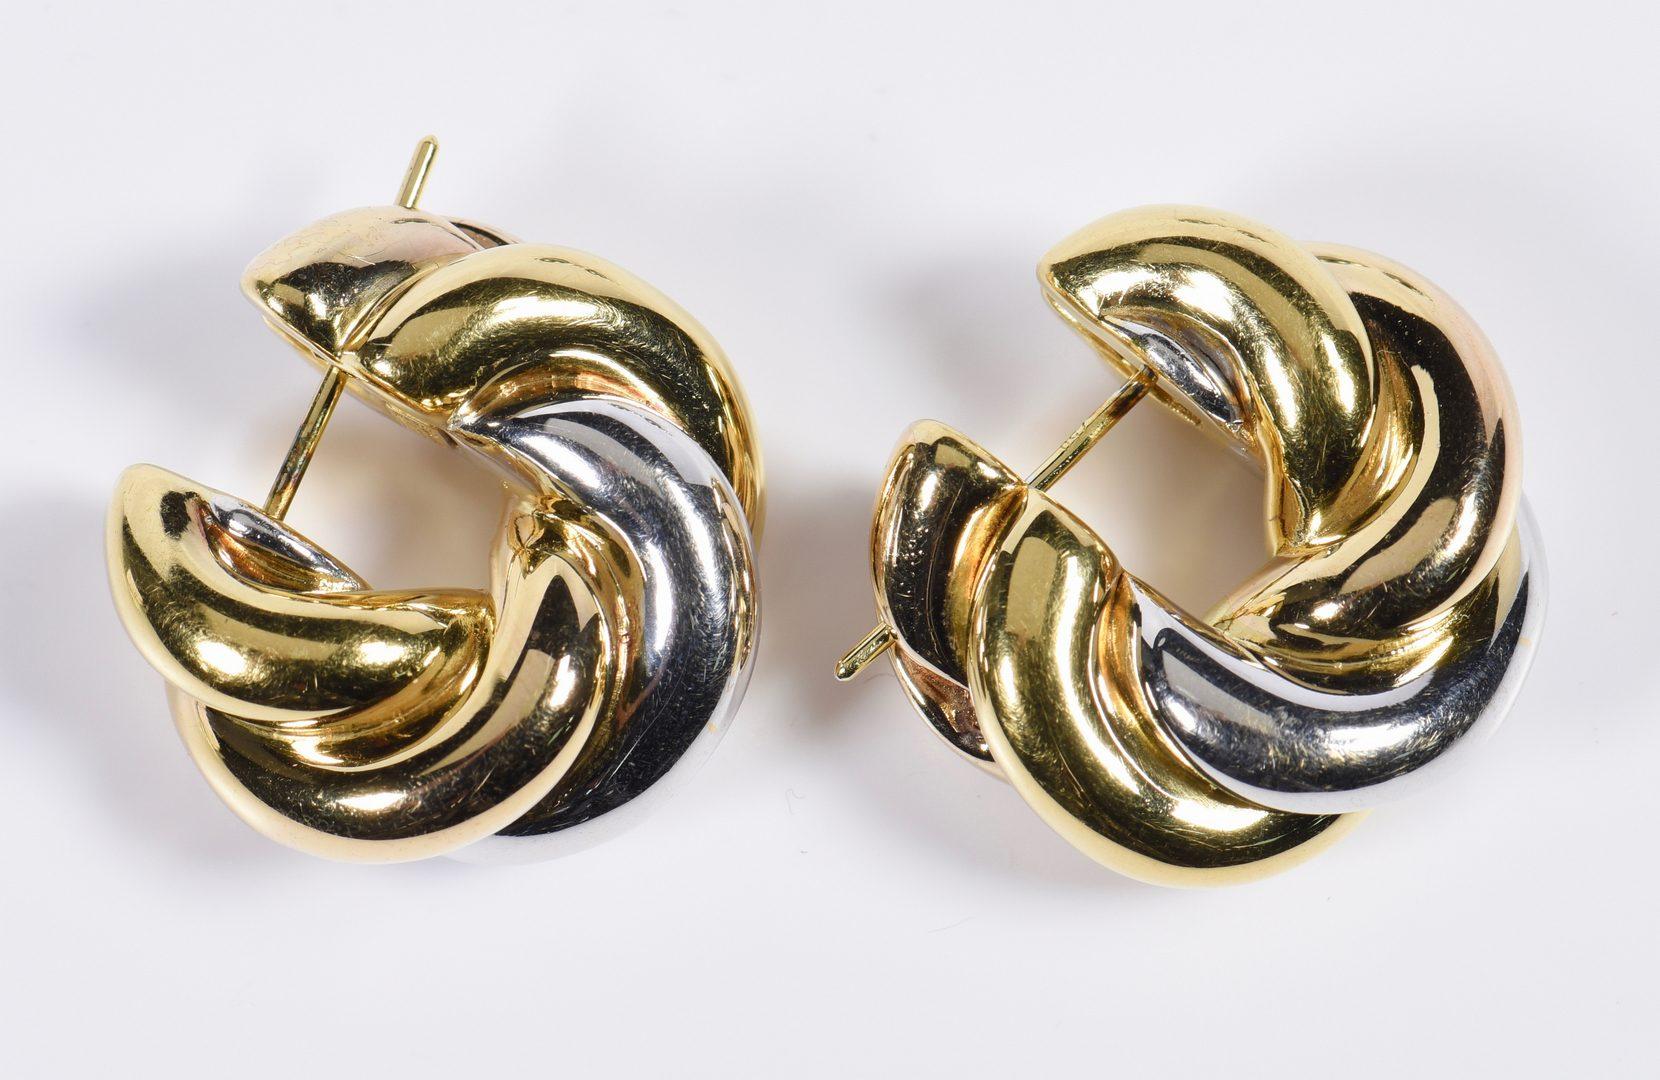 Lot 811: Two Pair 18K Earrings, incl Tahitian pearls